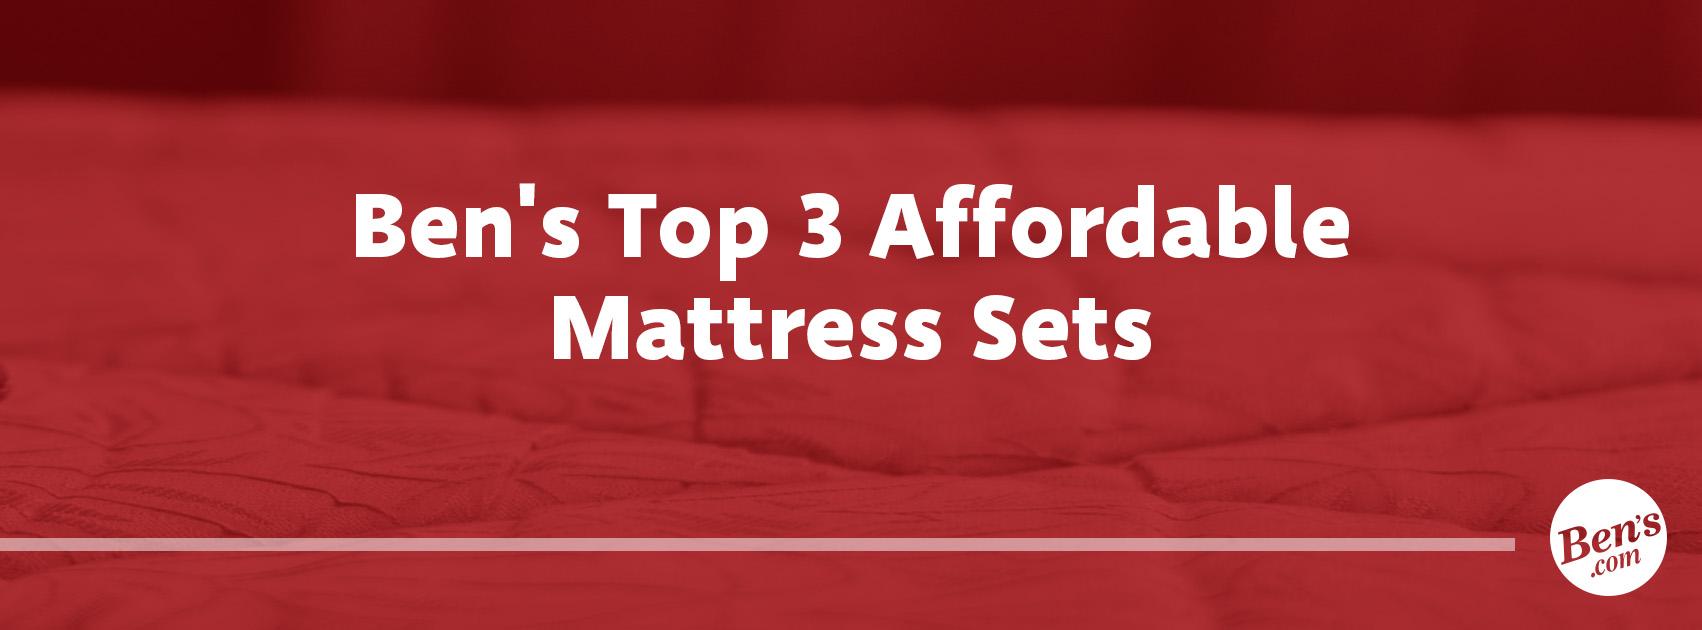 November-2-_-Bens-Top-3-Affordable-Mattress-Sets